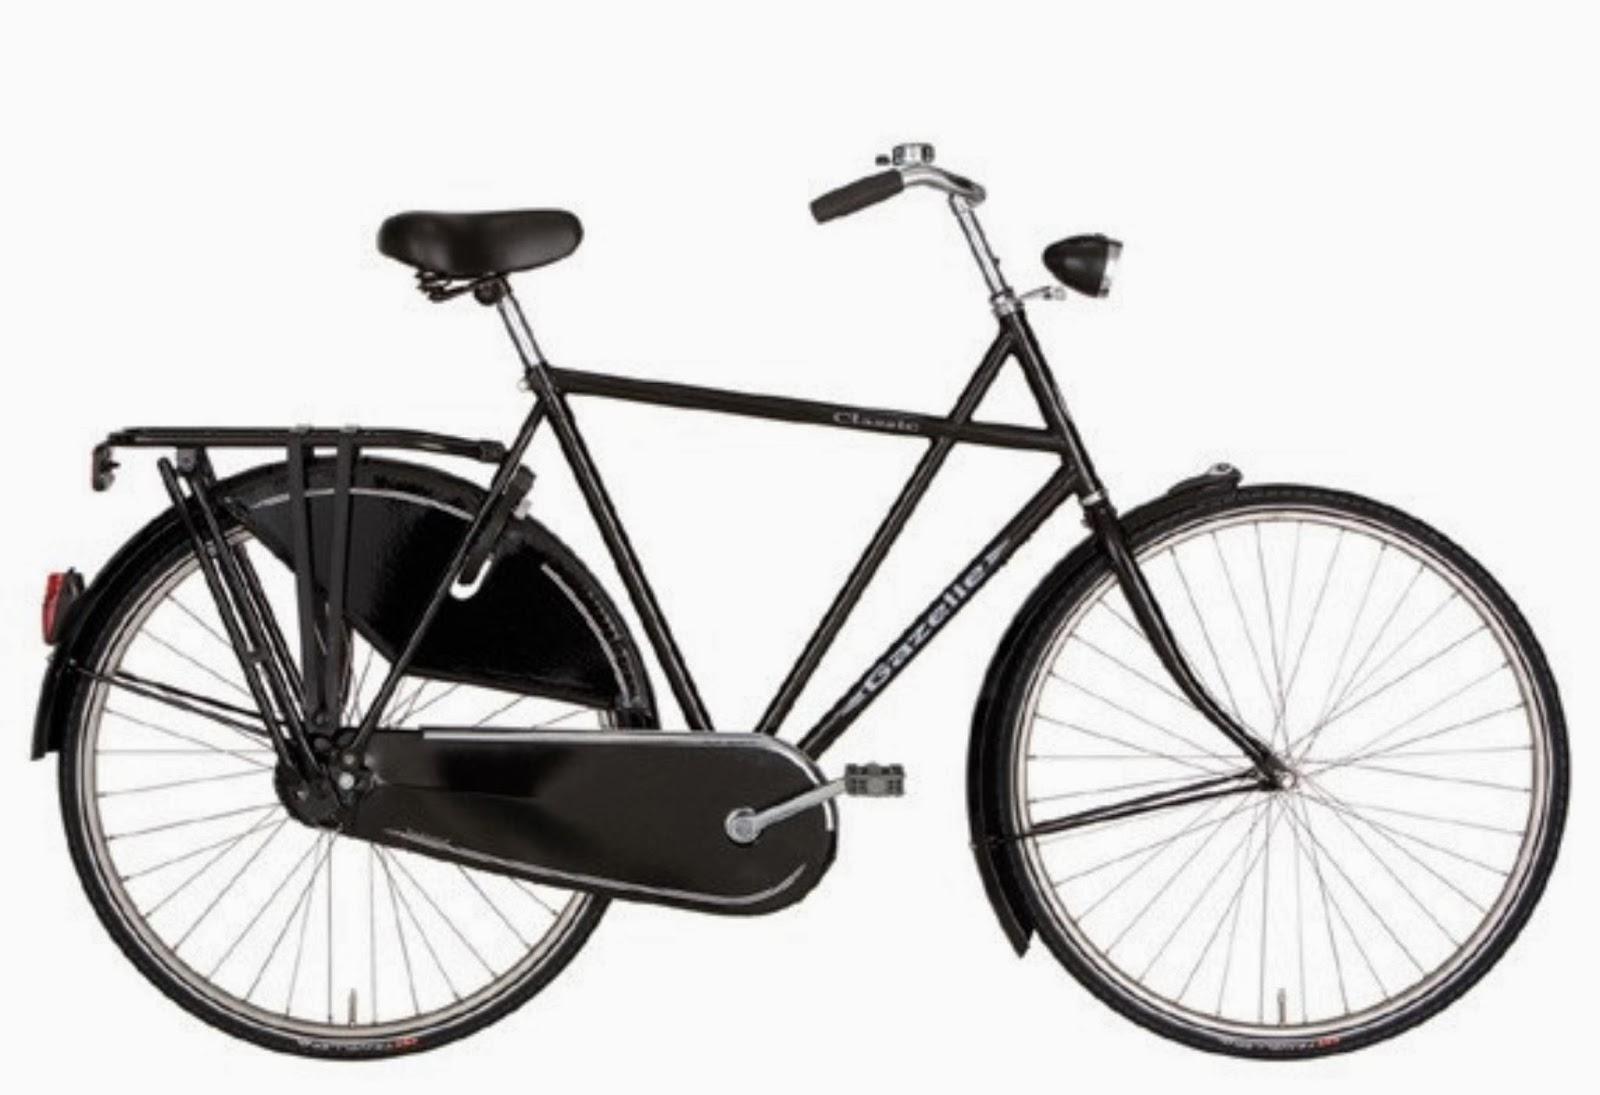 10 Sepeda Onthel Kuno Terkenal Buatan Belanda - Karang